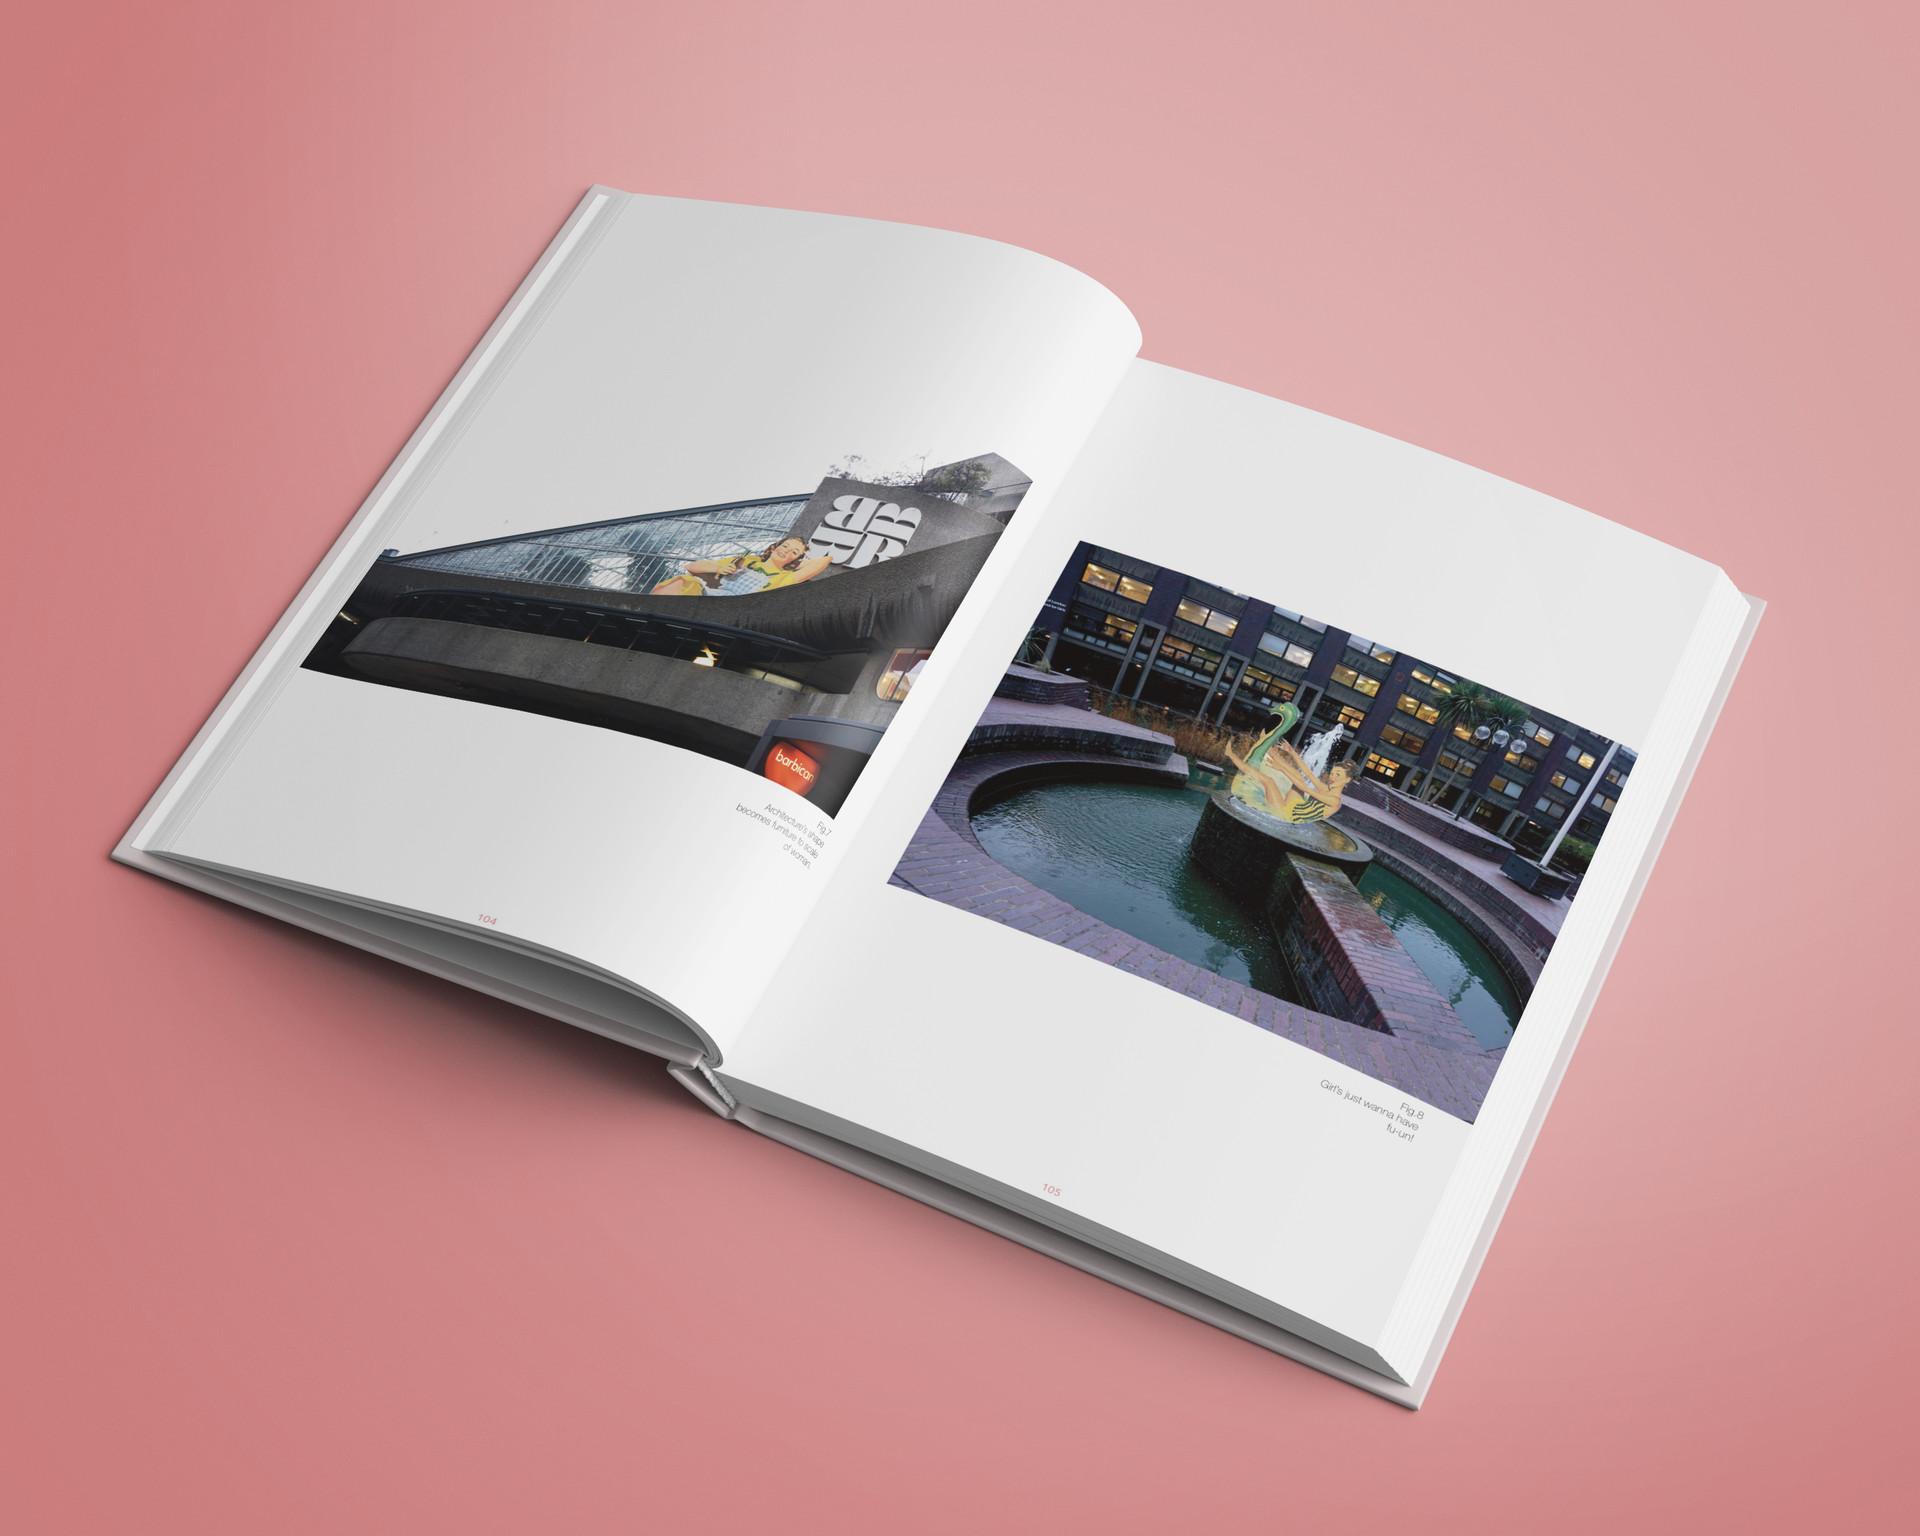 Book_Mockup_06PINK COLLAGE.jpg